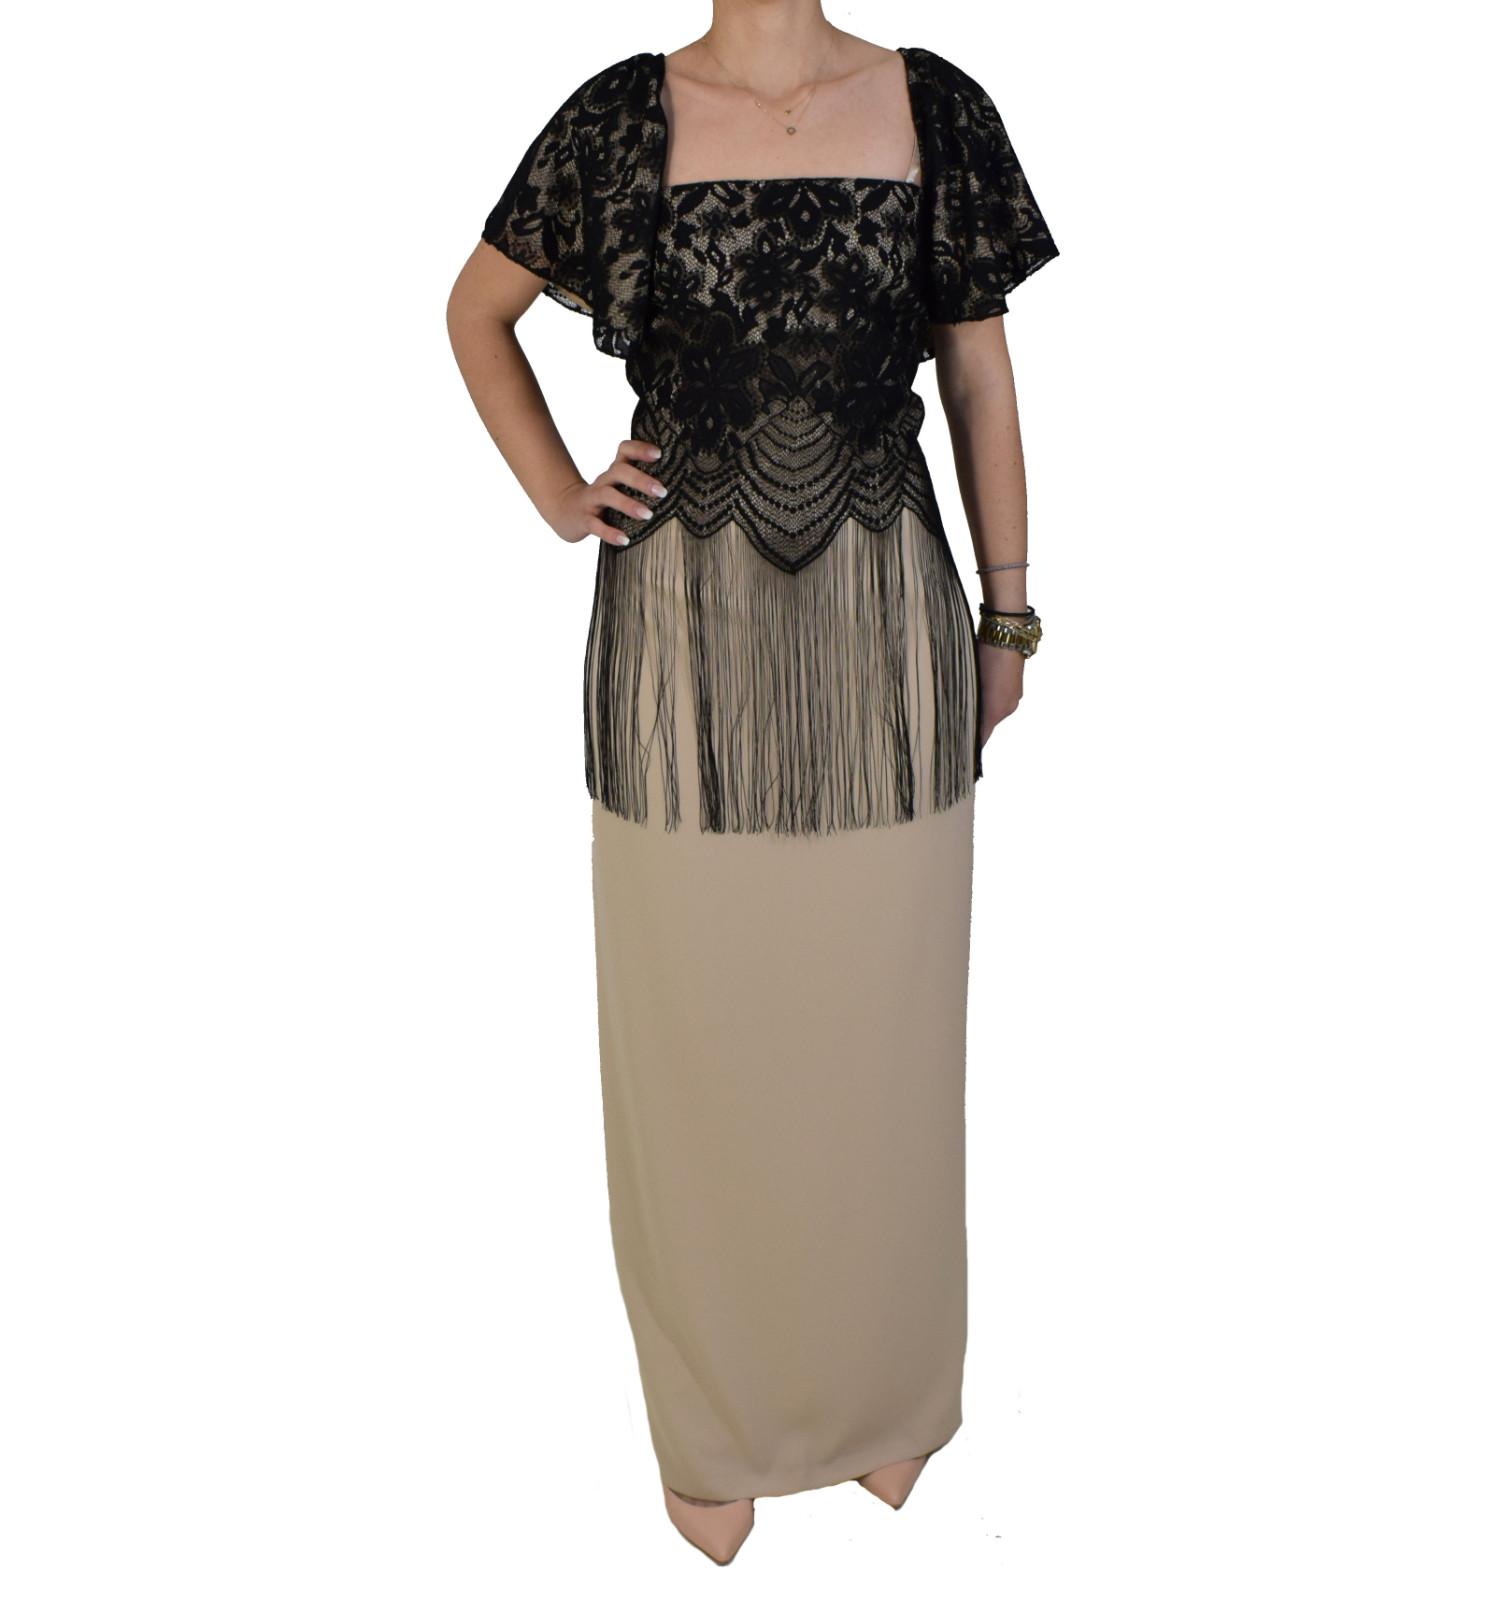 20cd20172336 Φόρεμα Maxi Με Δαντέλα Forel 505012 Μπεζ Μαύρο forel 505012 mpez ...